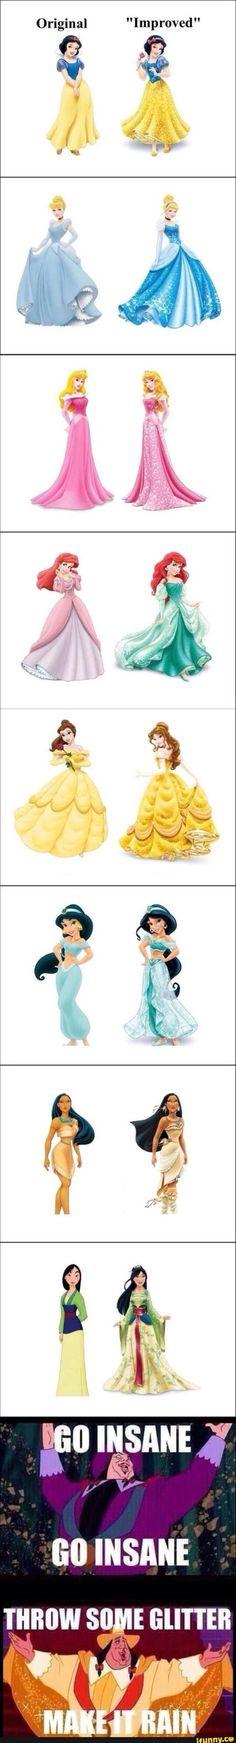 disney, princesses, improved, add, glitter